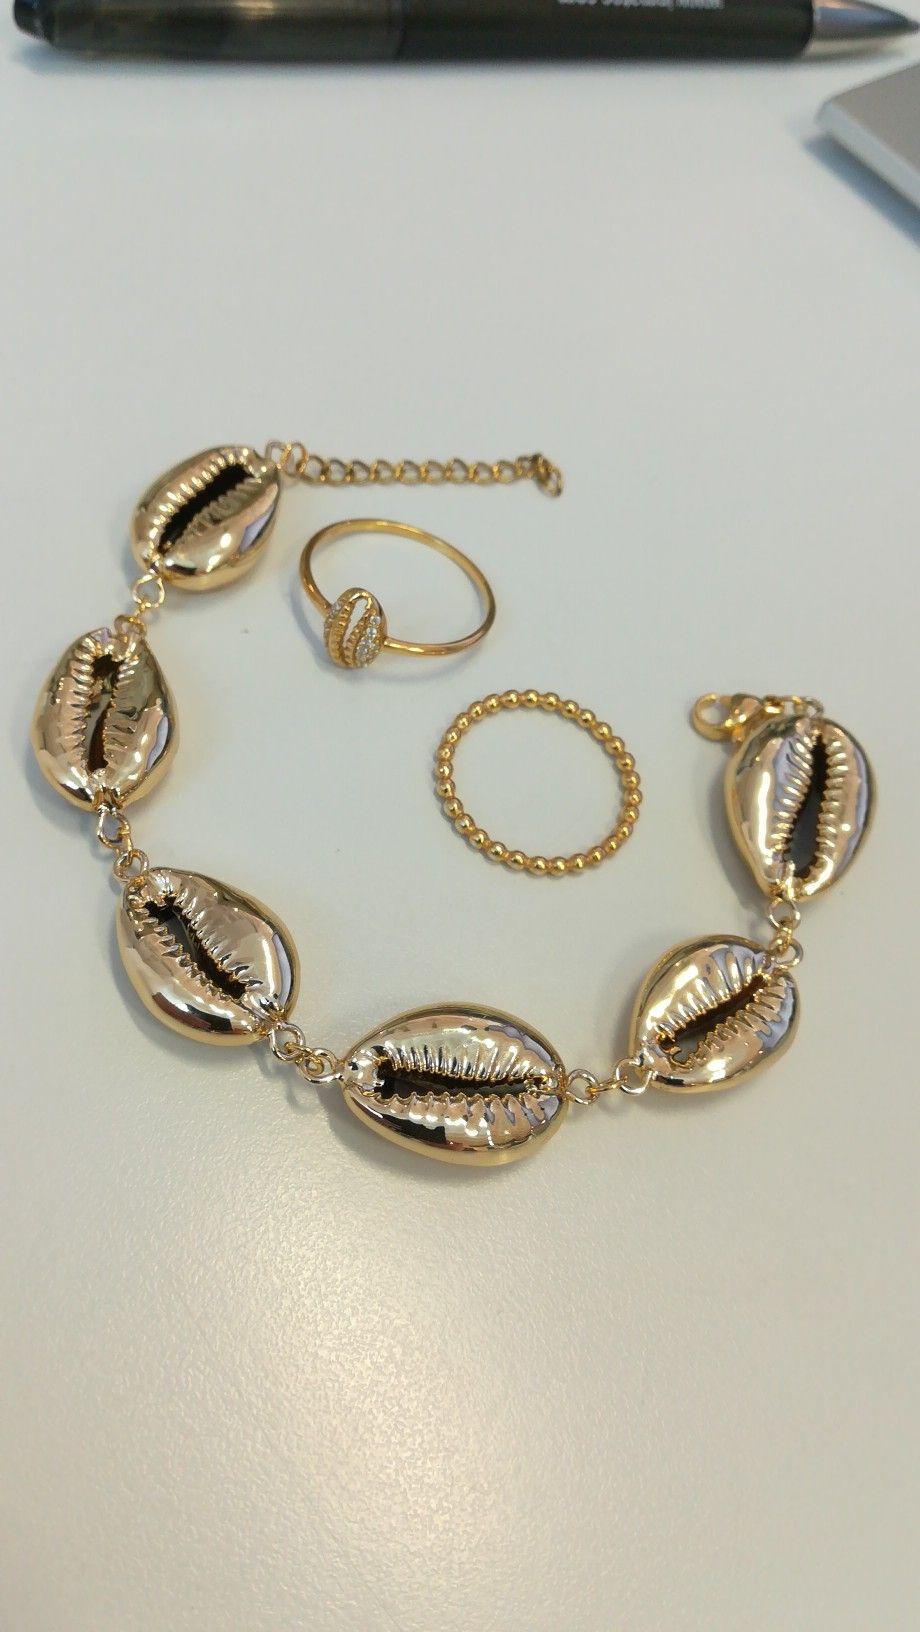 Shell jewellery #nurage